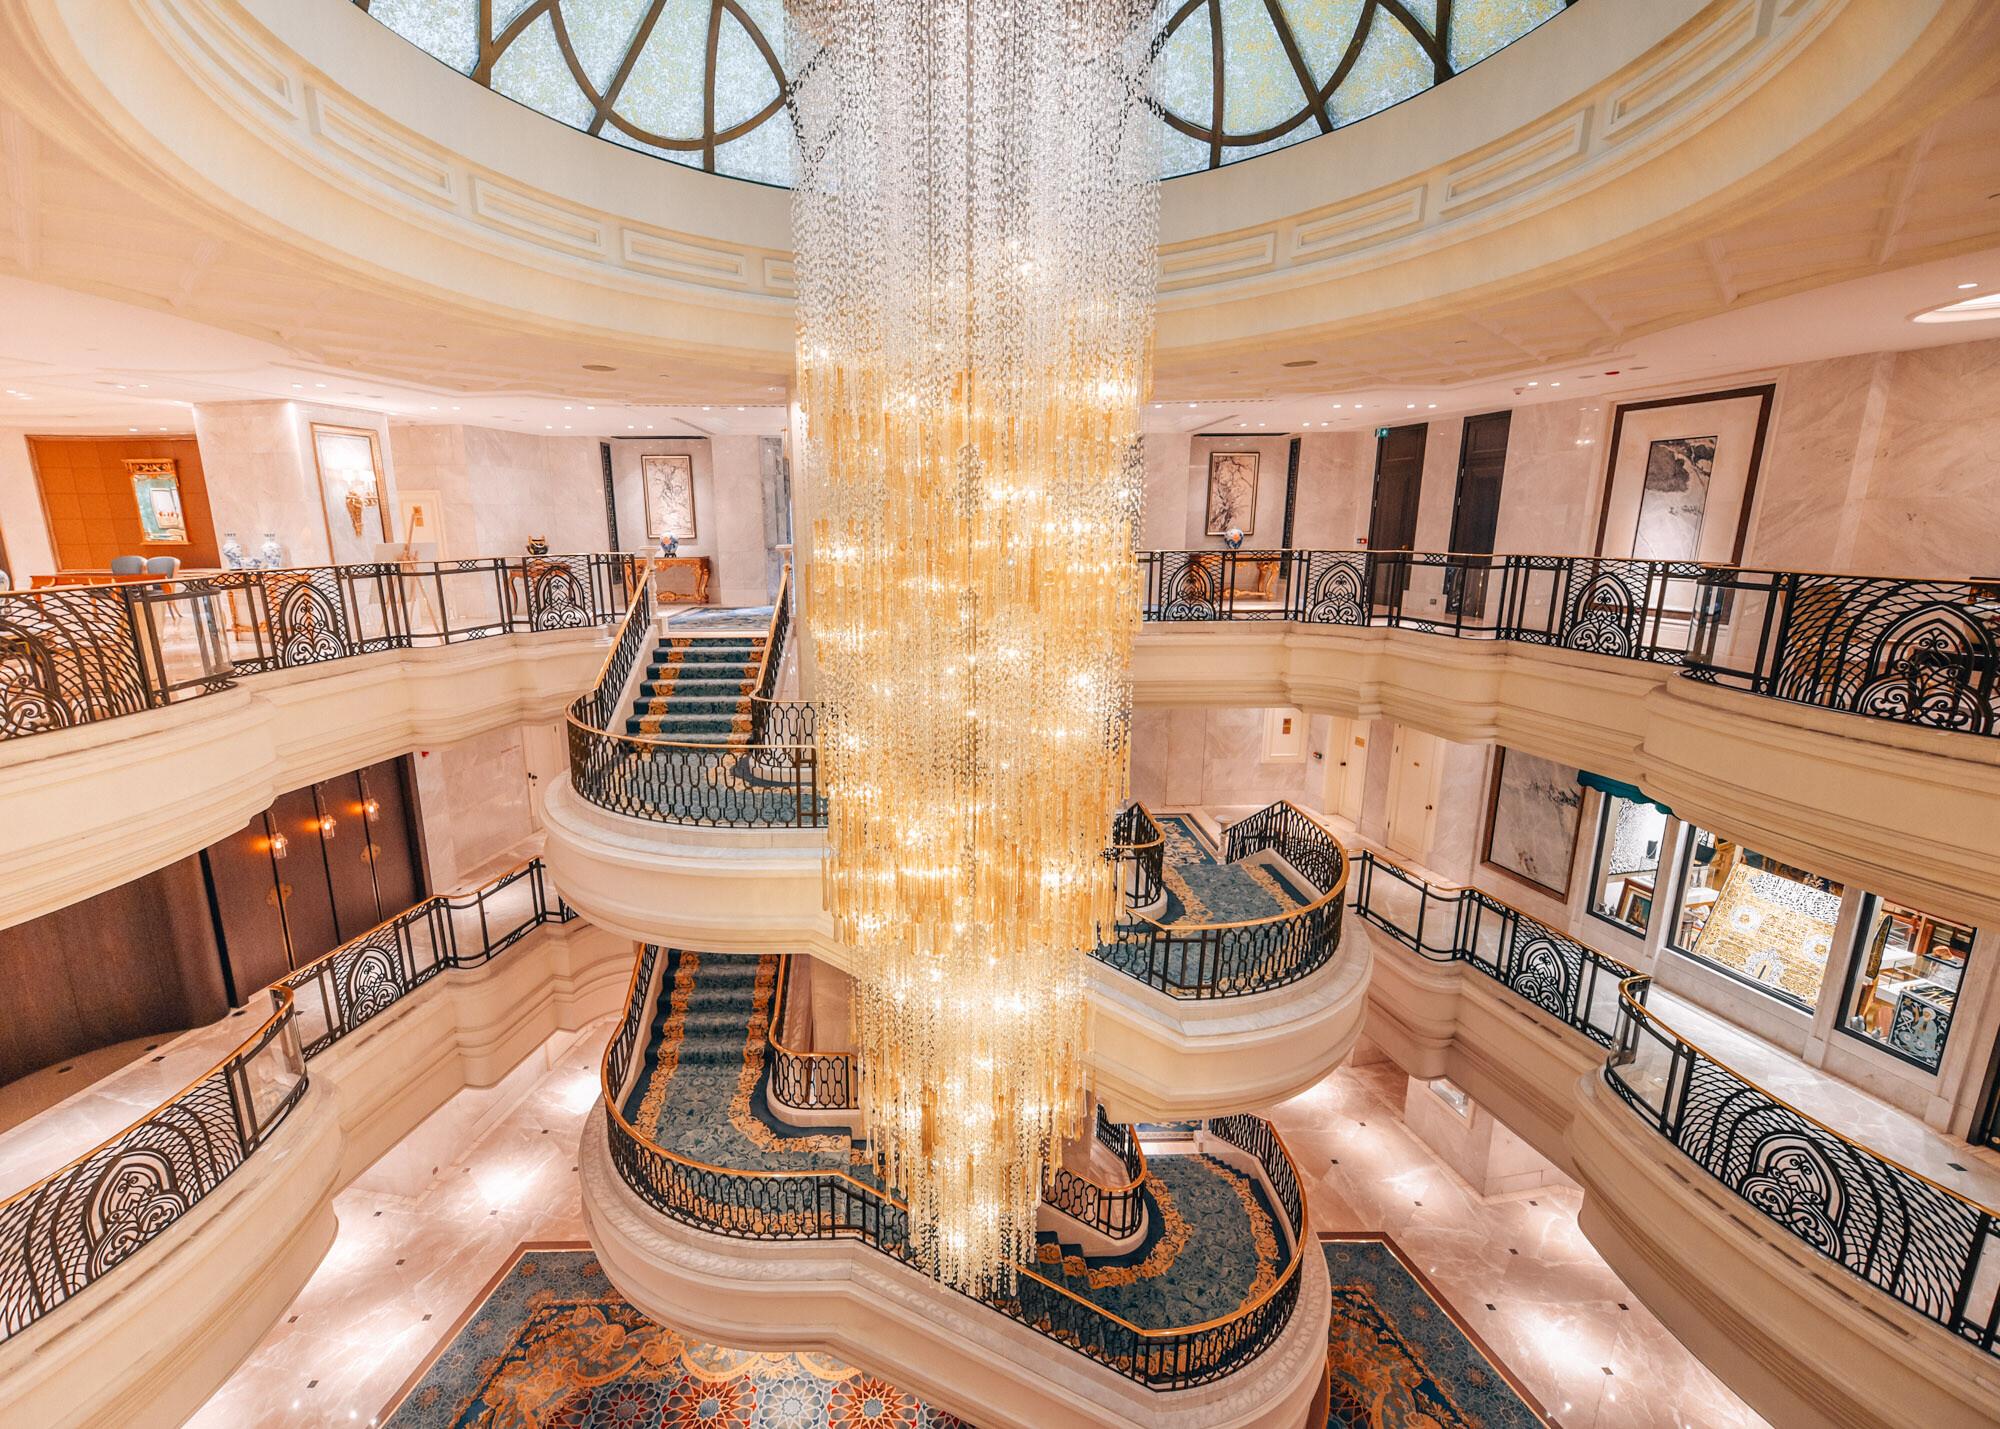 هتل شانگری لا بسفروس، استانبول (Shangri La Bosphorus Hotel)